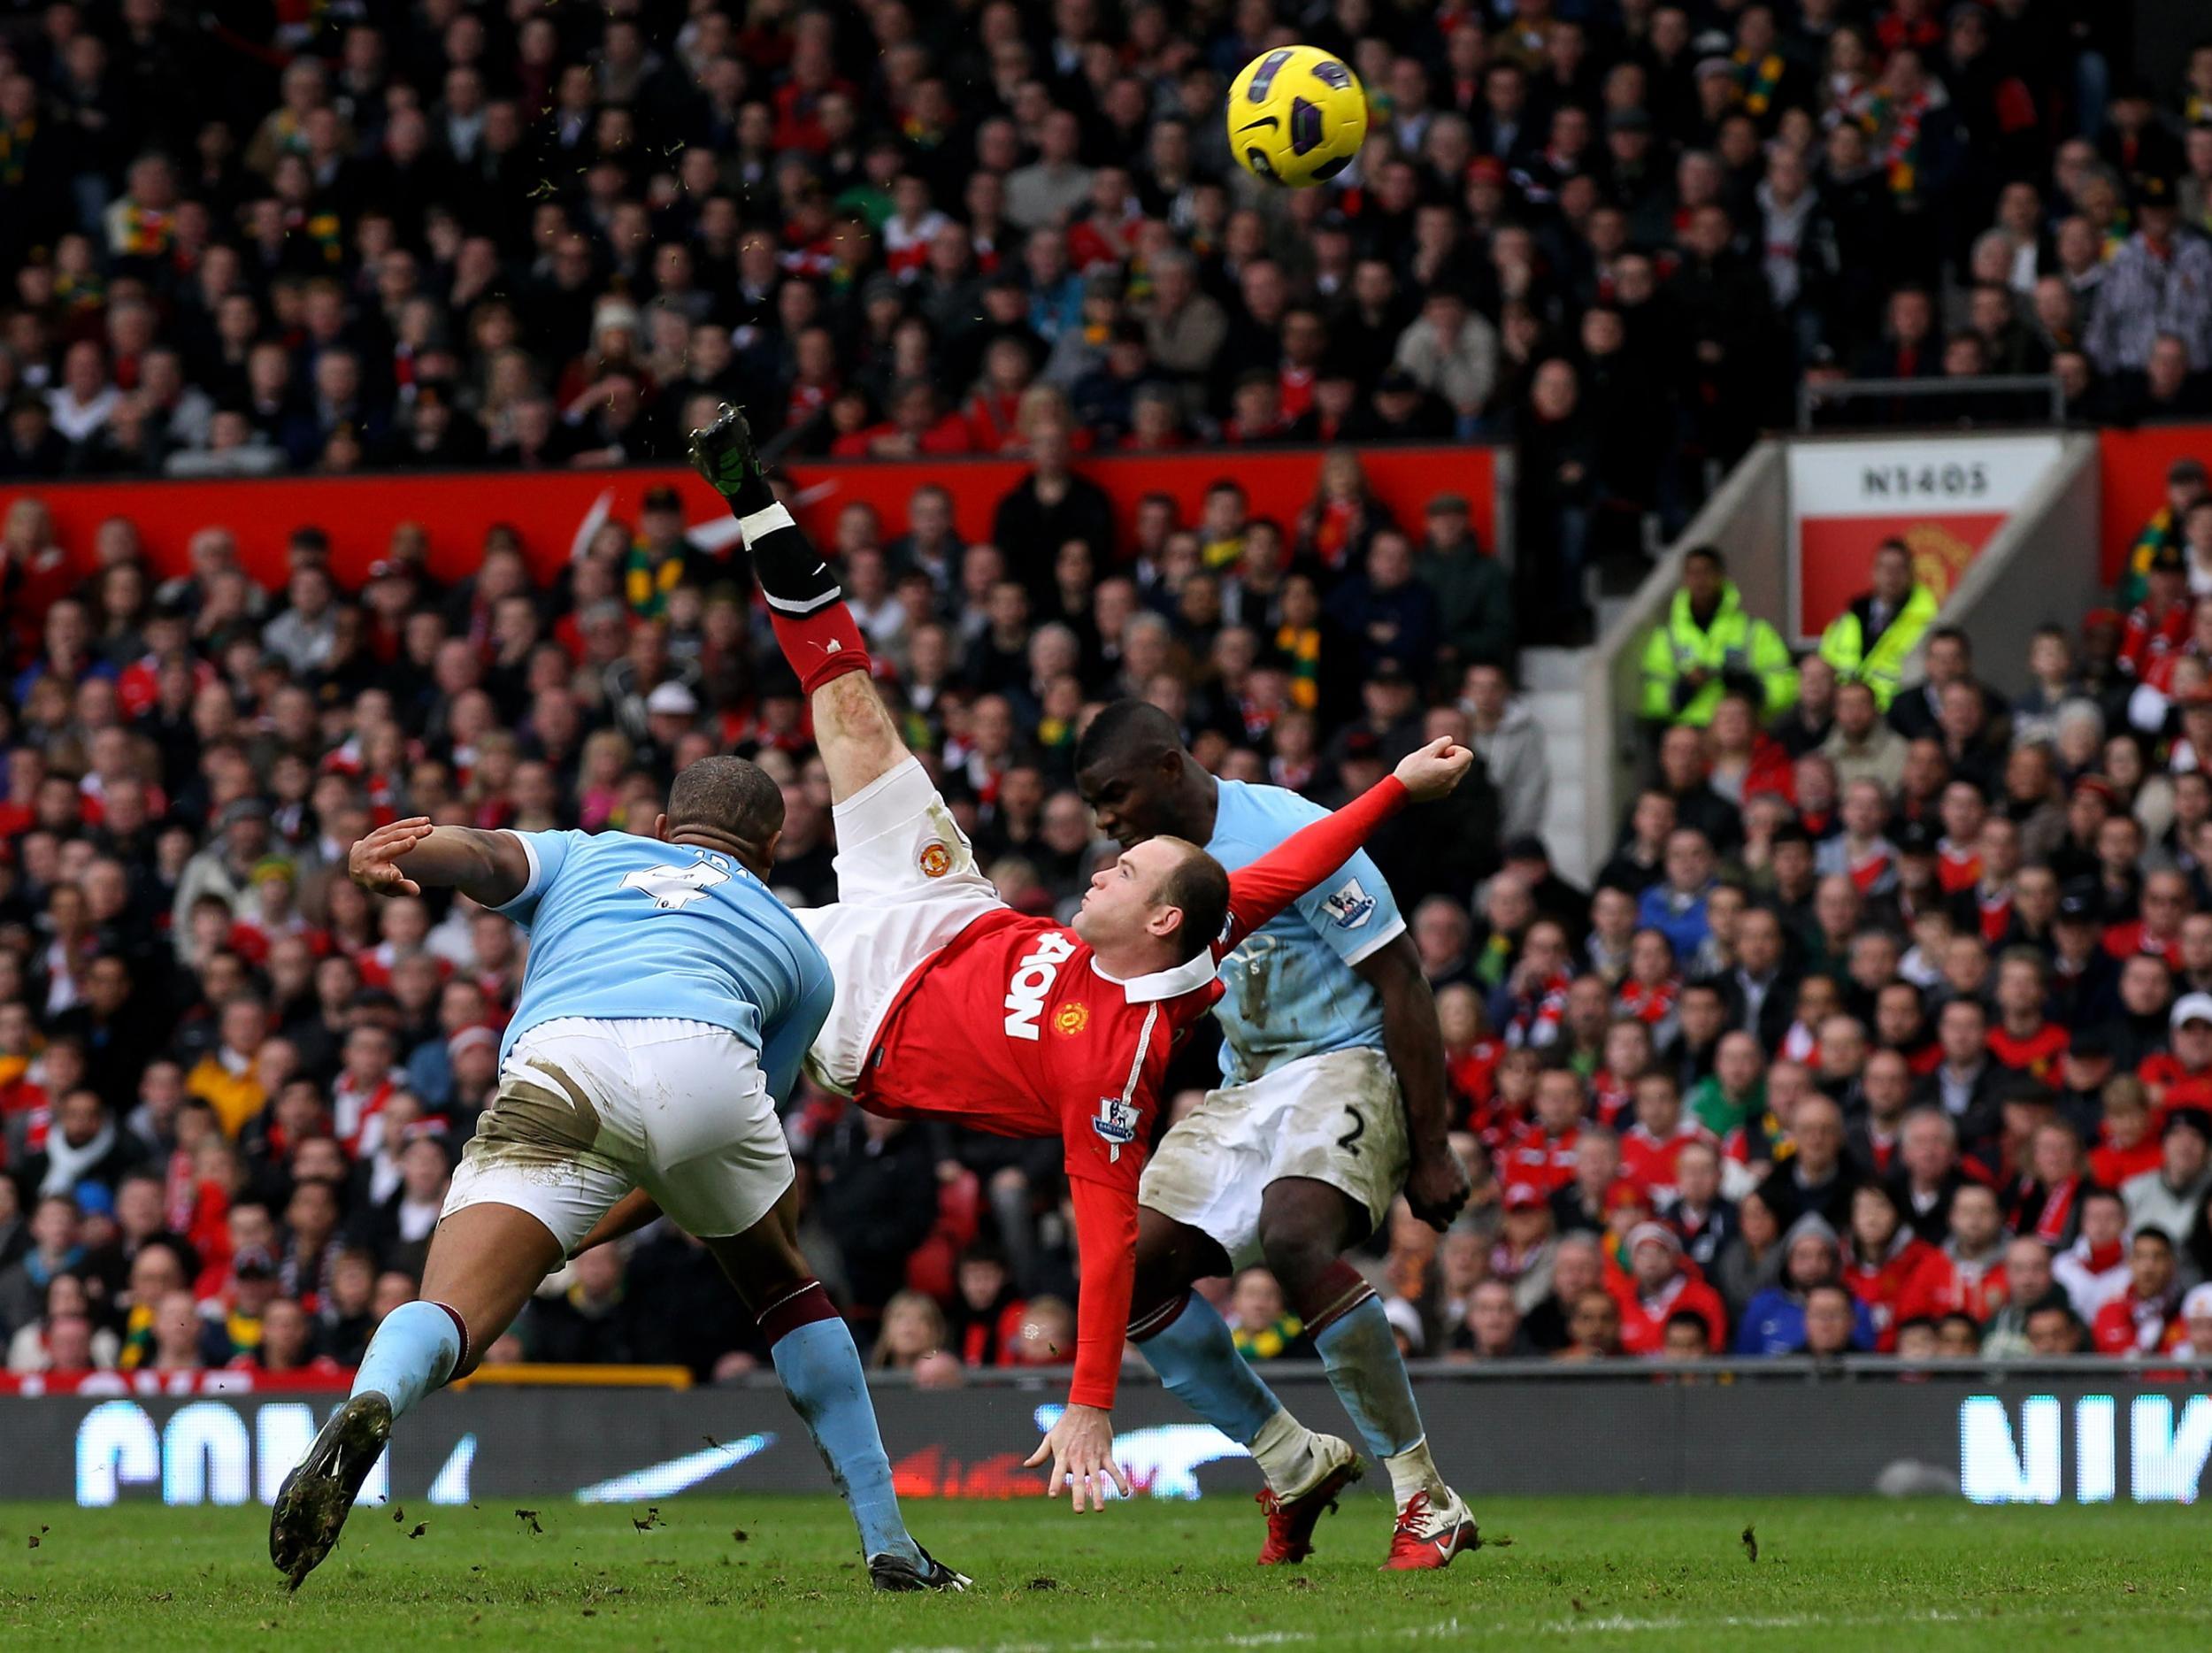 29. Wayne Rooney